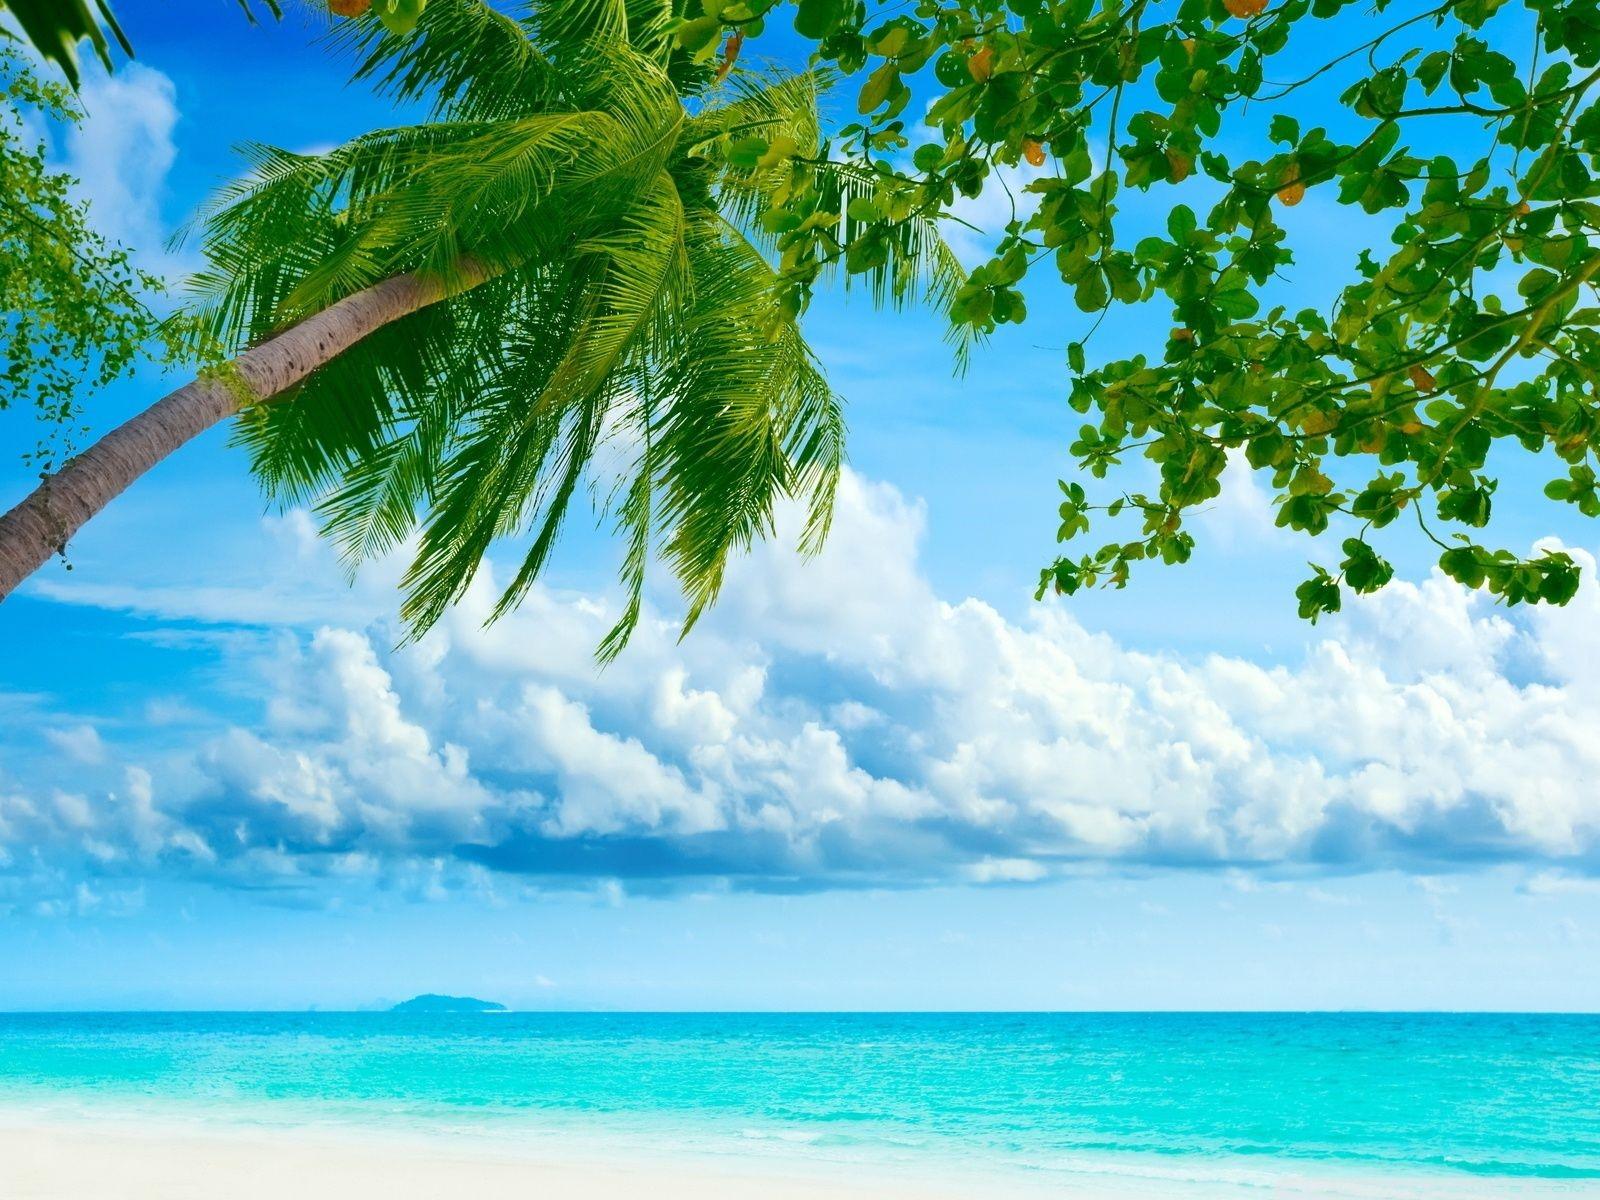 Tropical Beach Landscape iphone Wallpaper